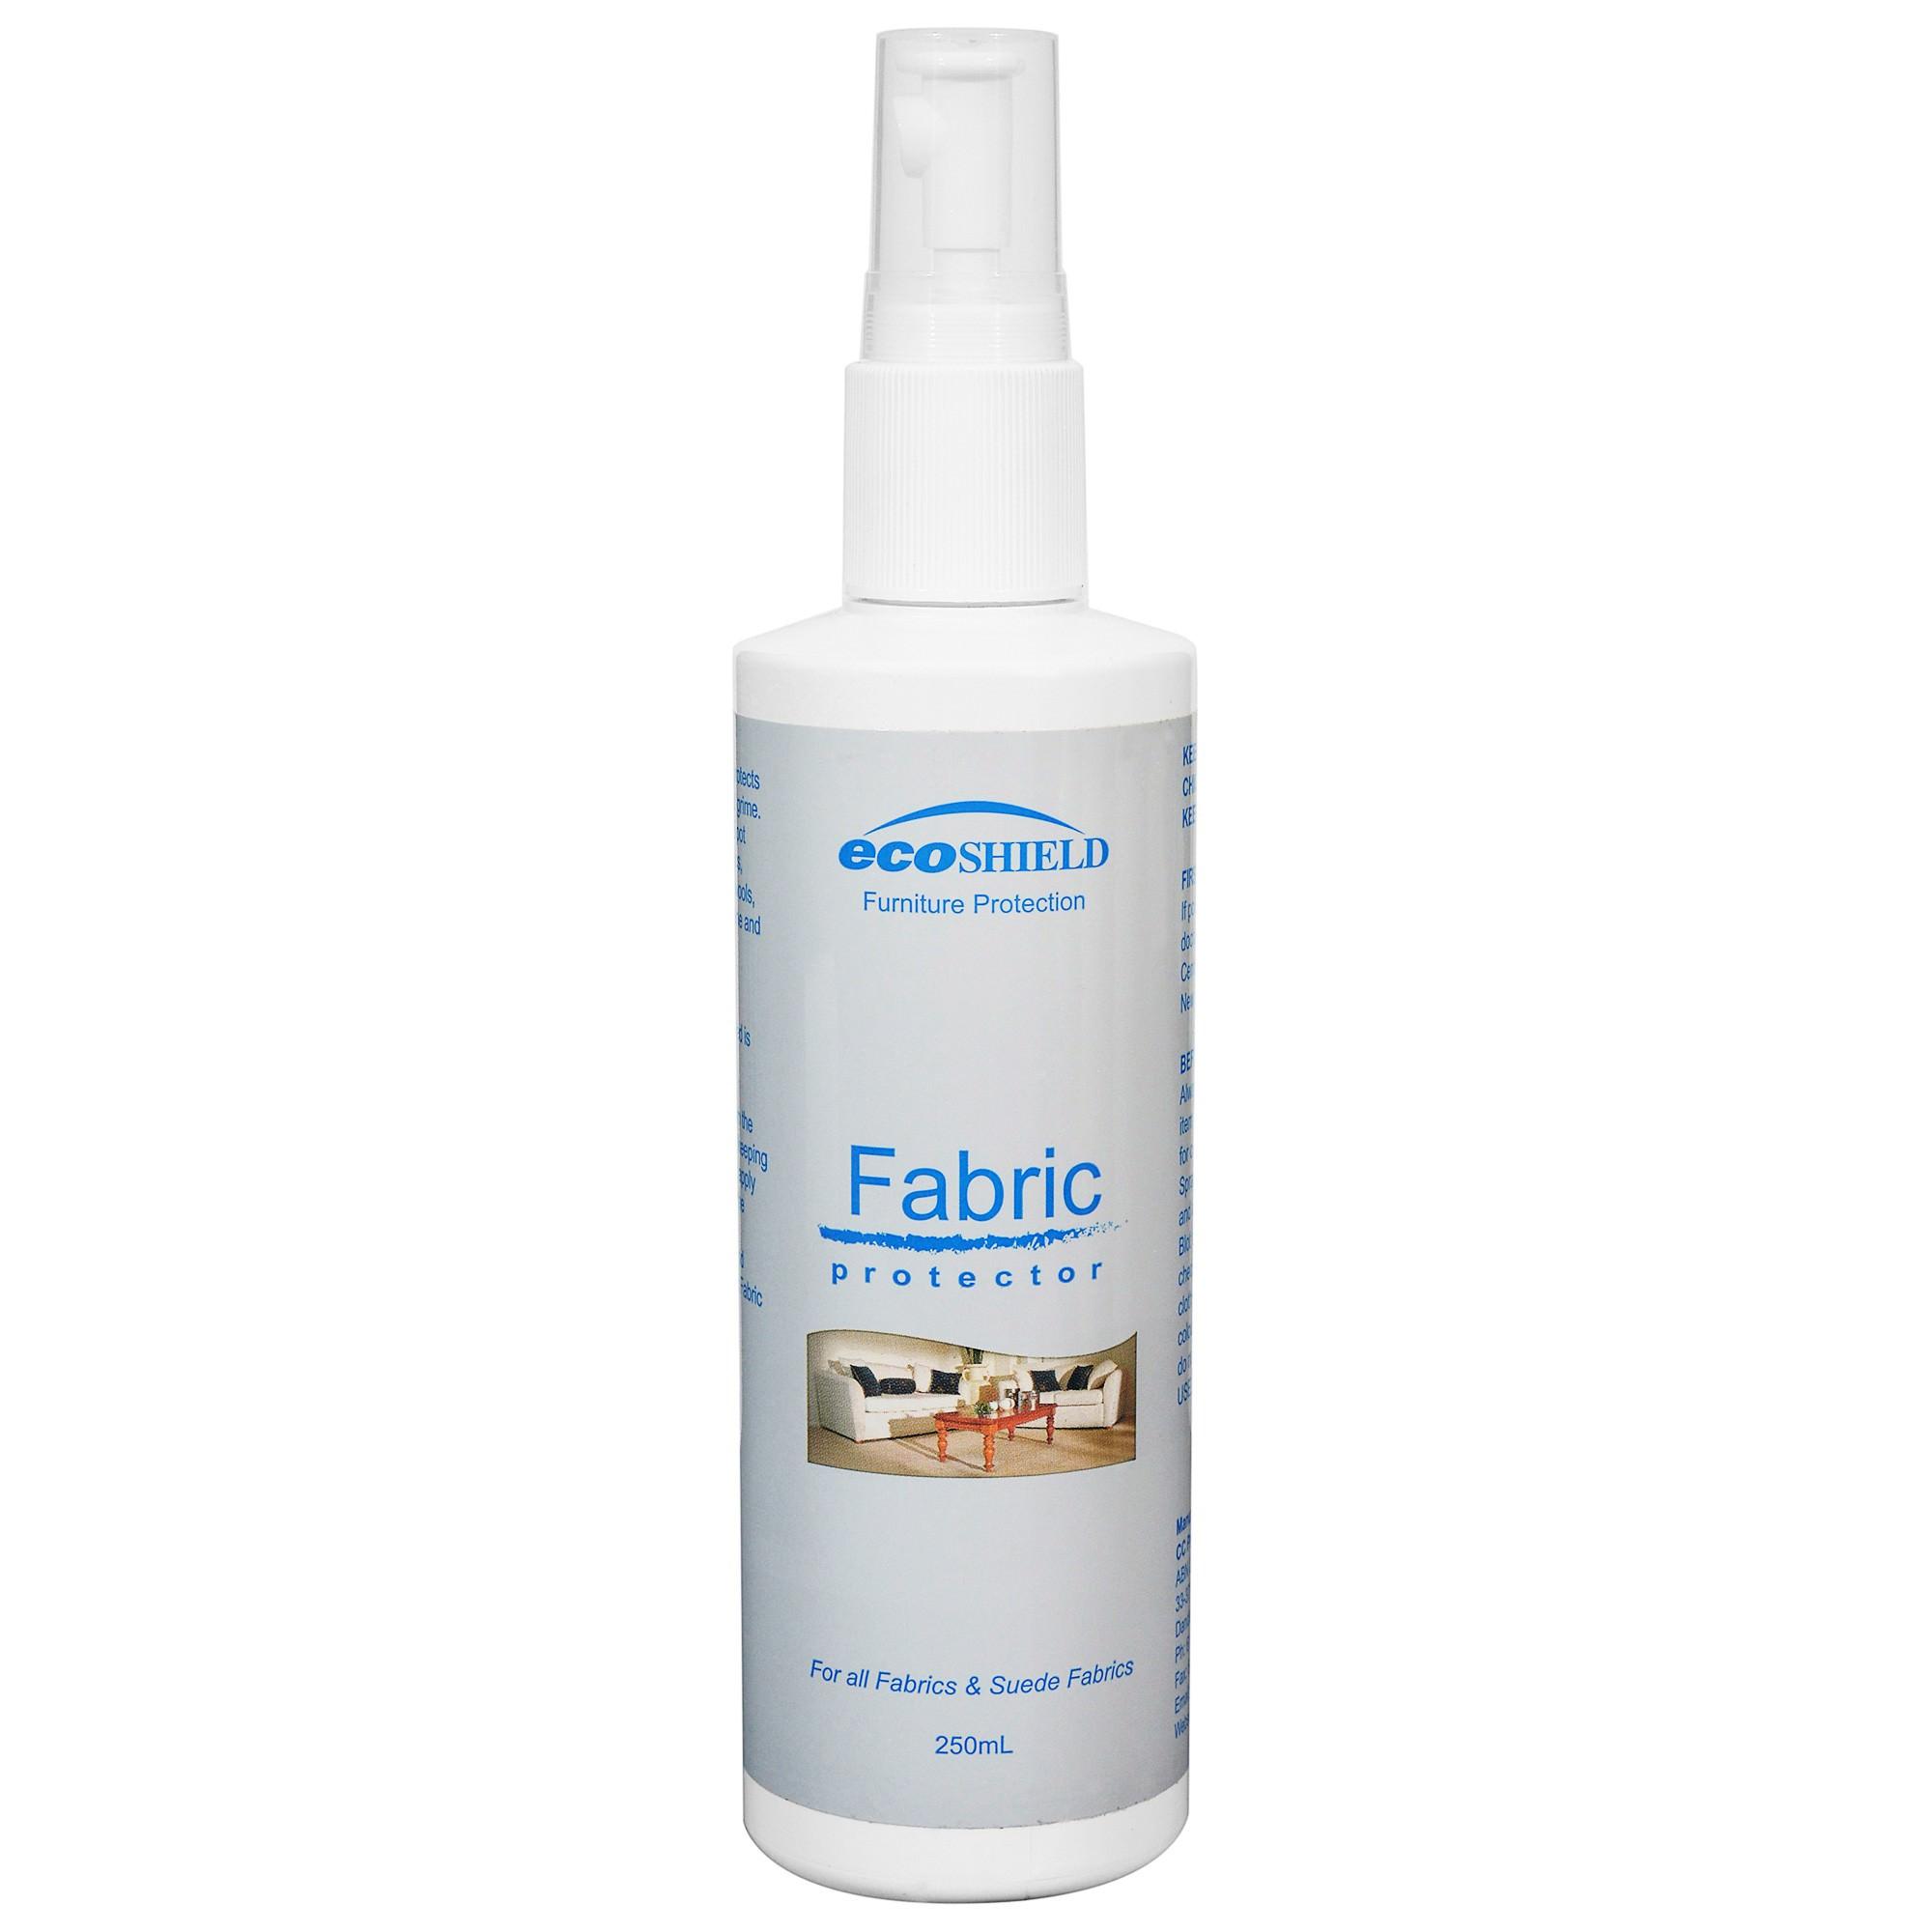 Ecoshield Fabric Protector, 250ml